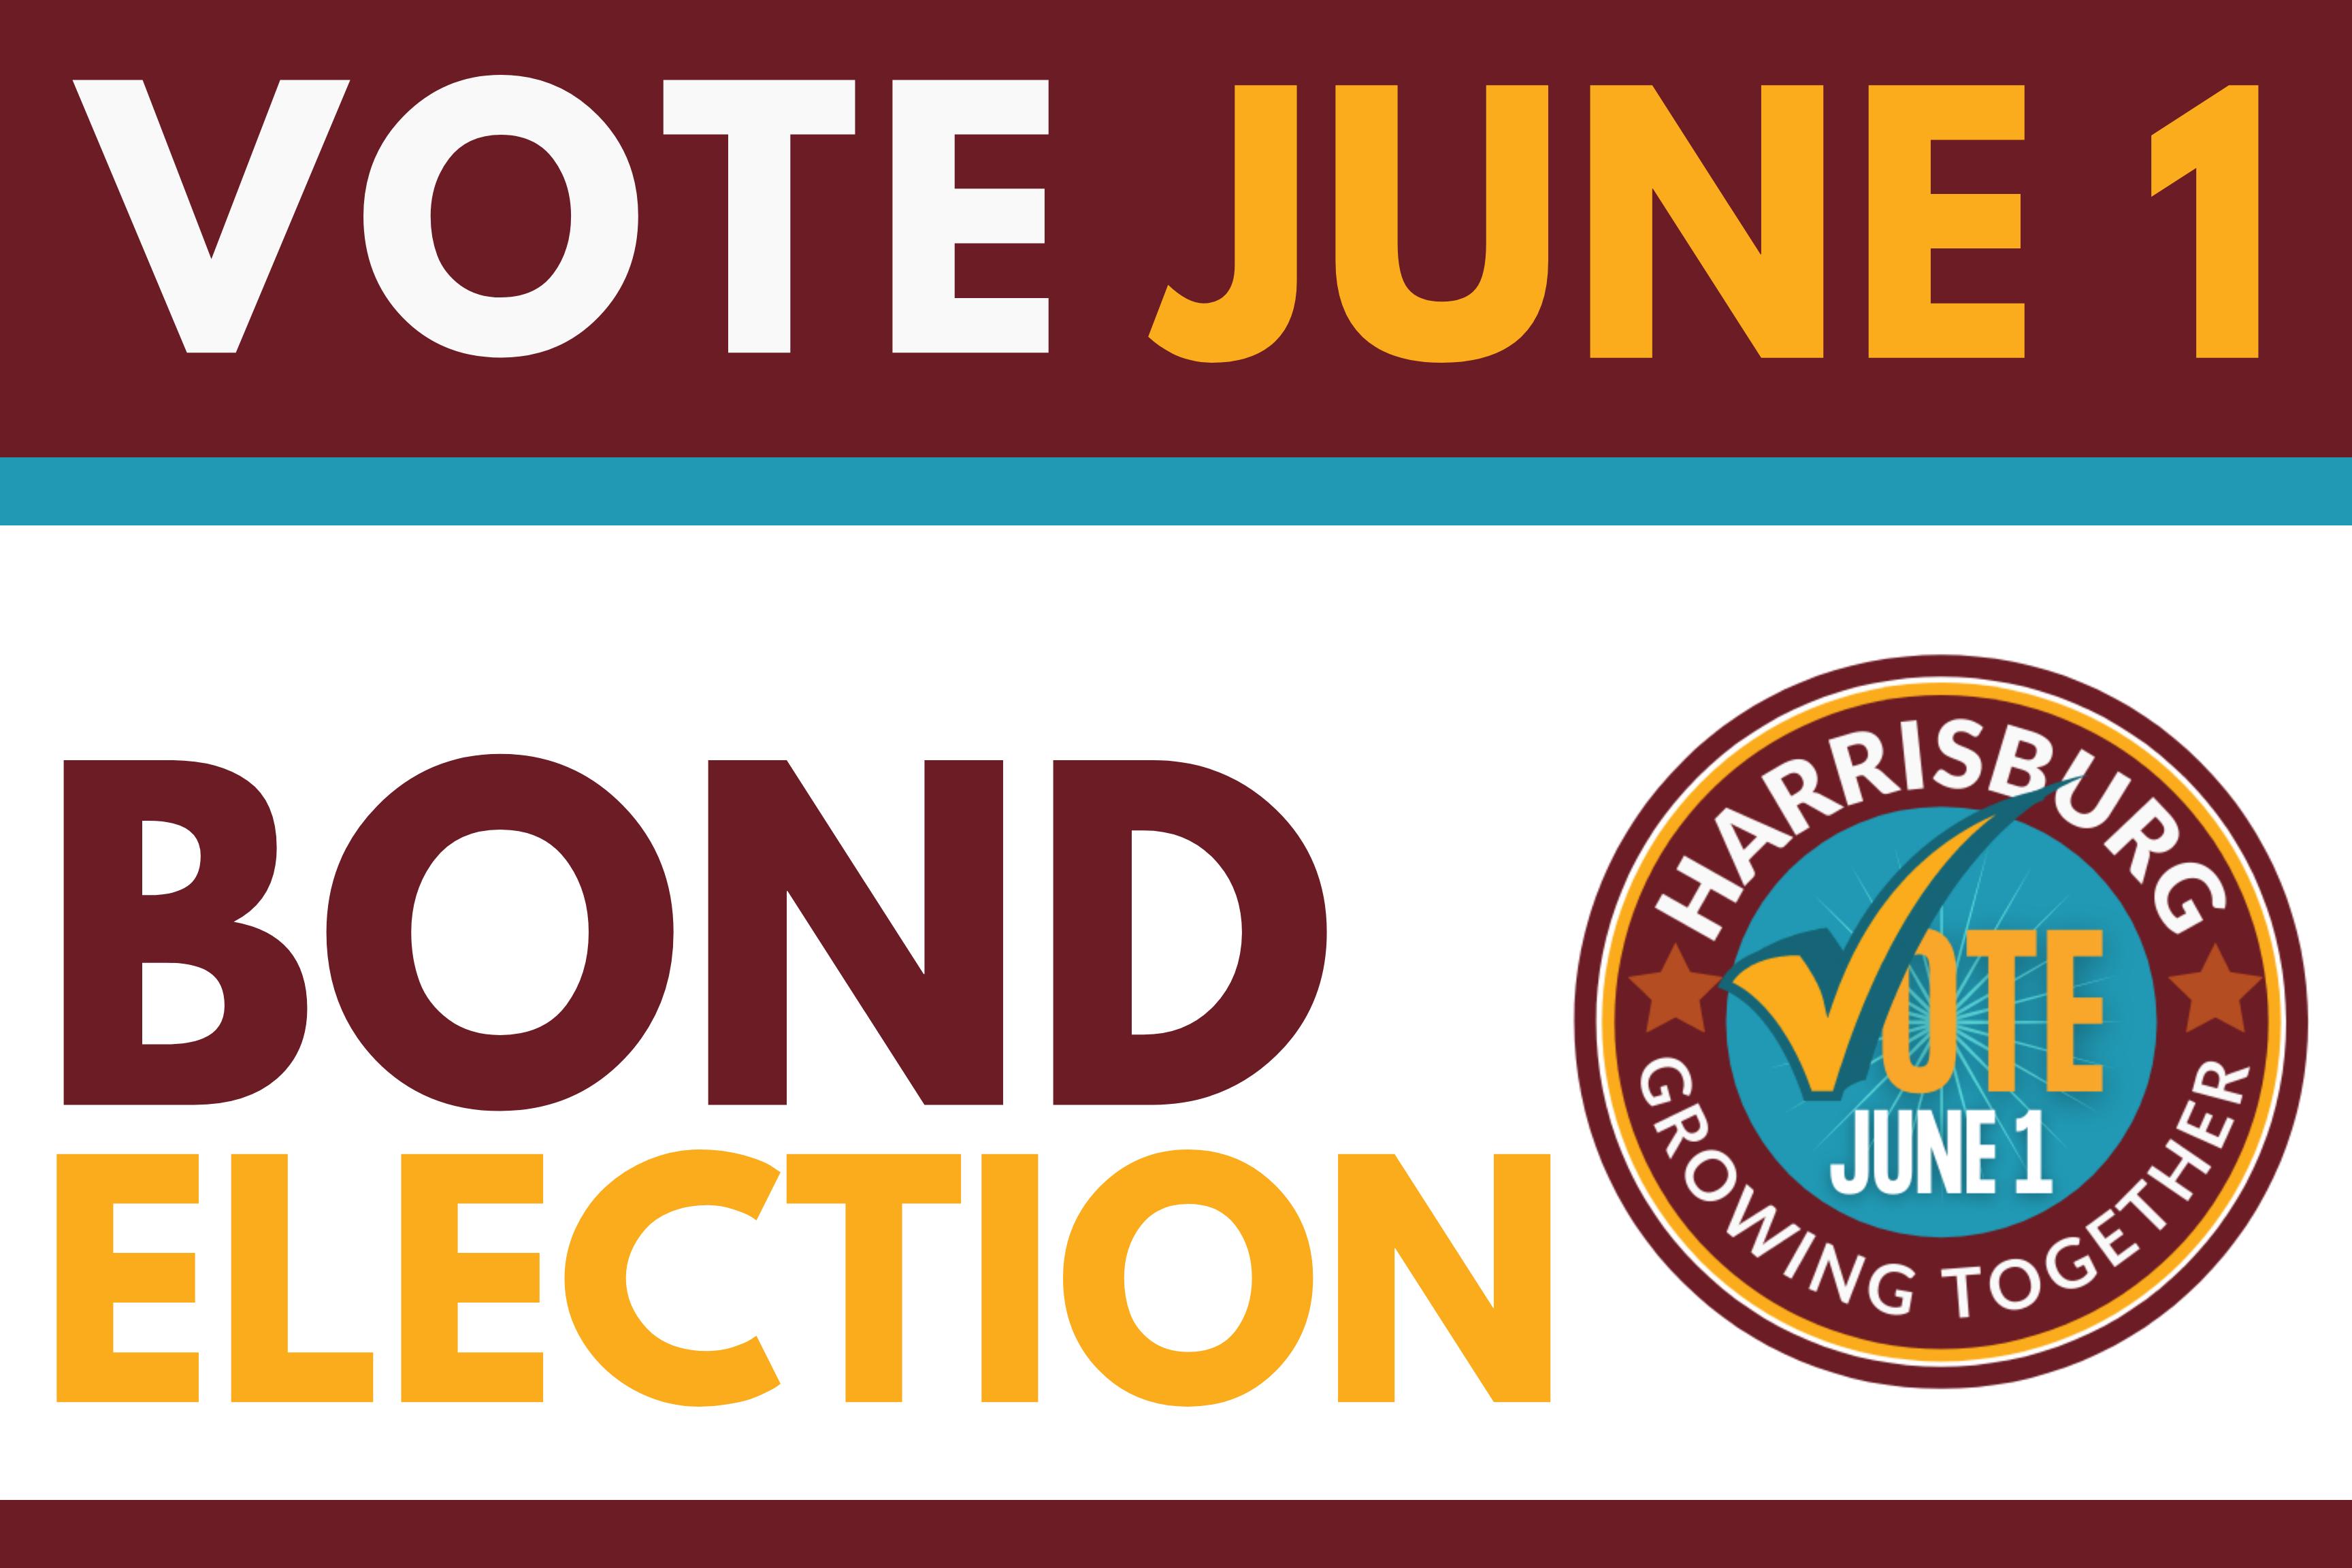 bond election